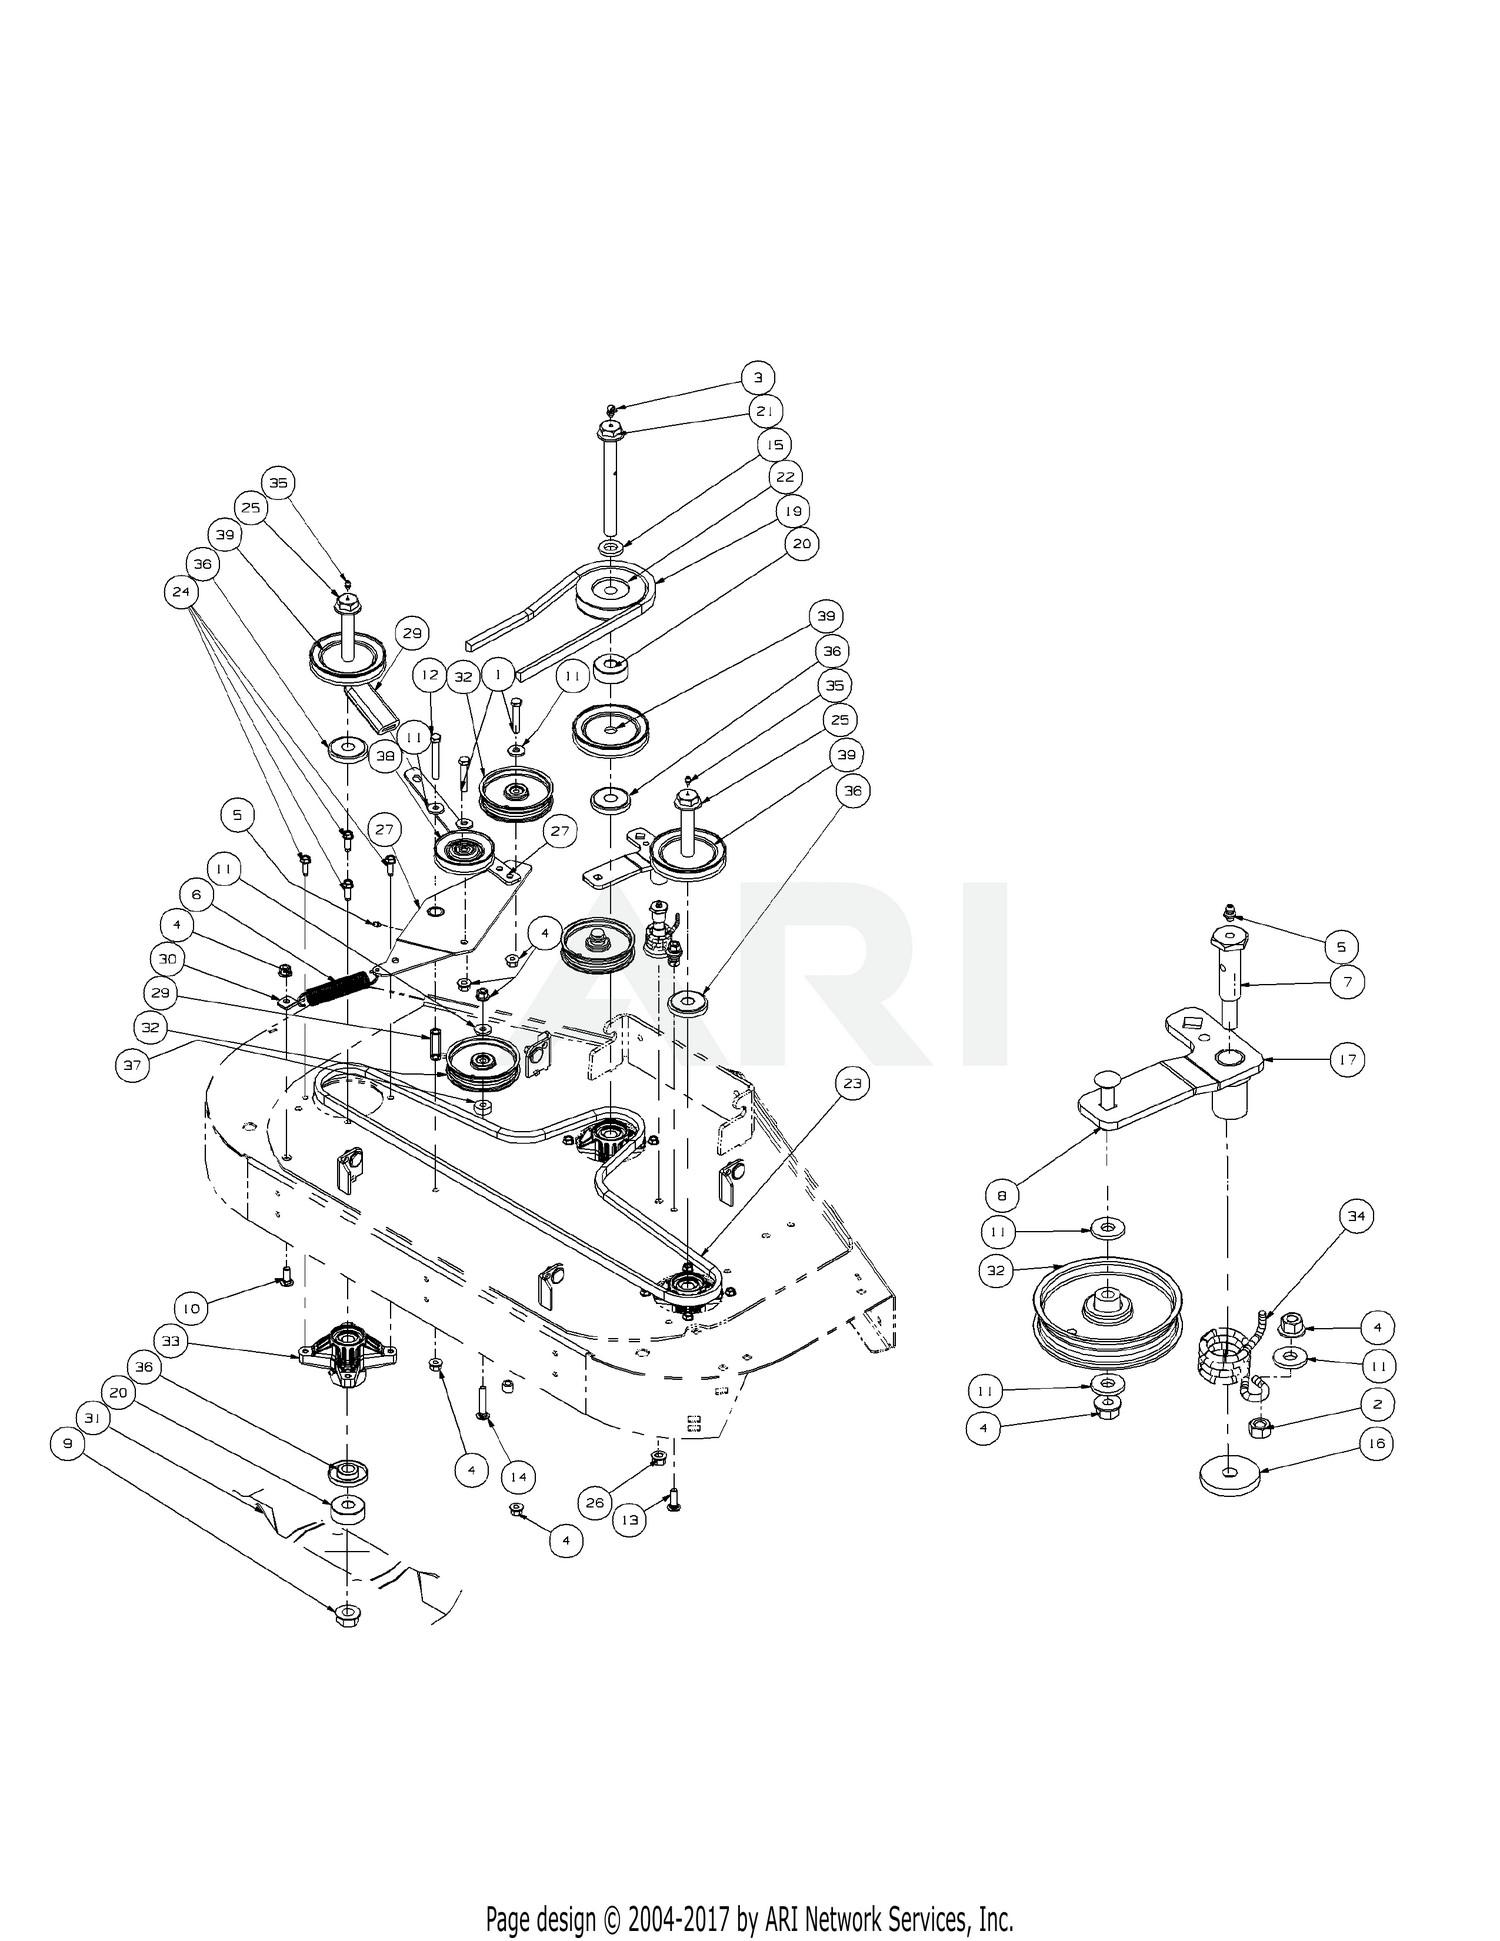 20 Hp Kohler Engine Diagram Cub Cadet Parts Diagrams Cub Cadet Enforcer 44 53ah3agf050 20hp Of 20 Hp Kohler Engine Diagram